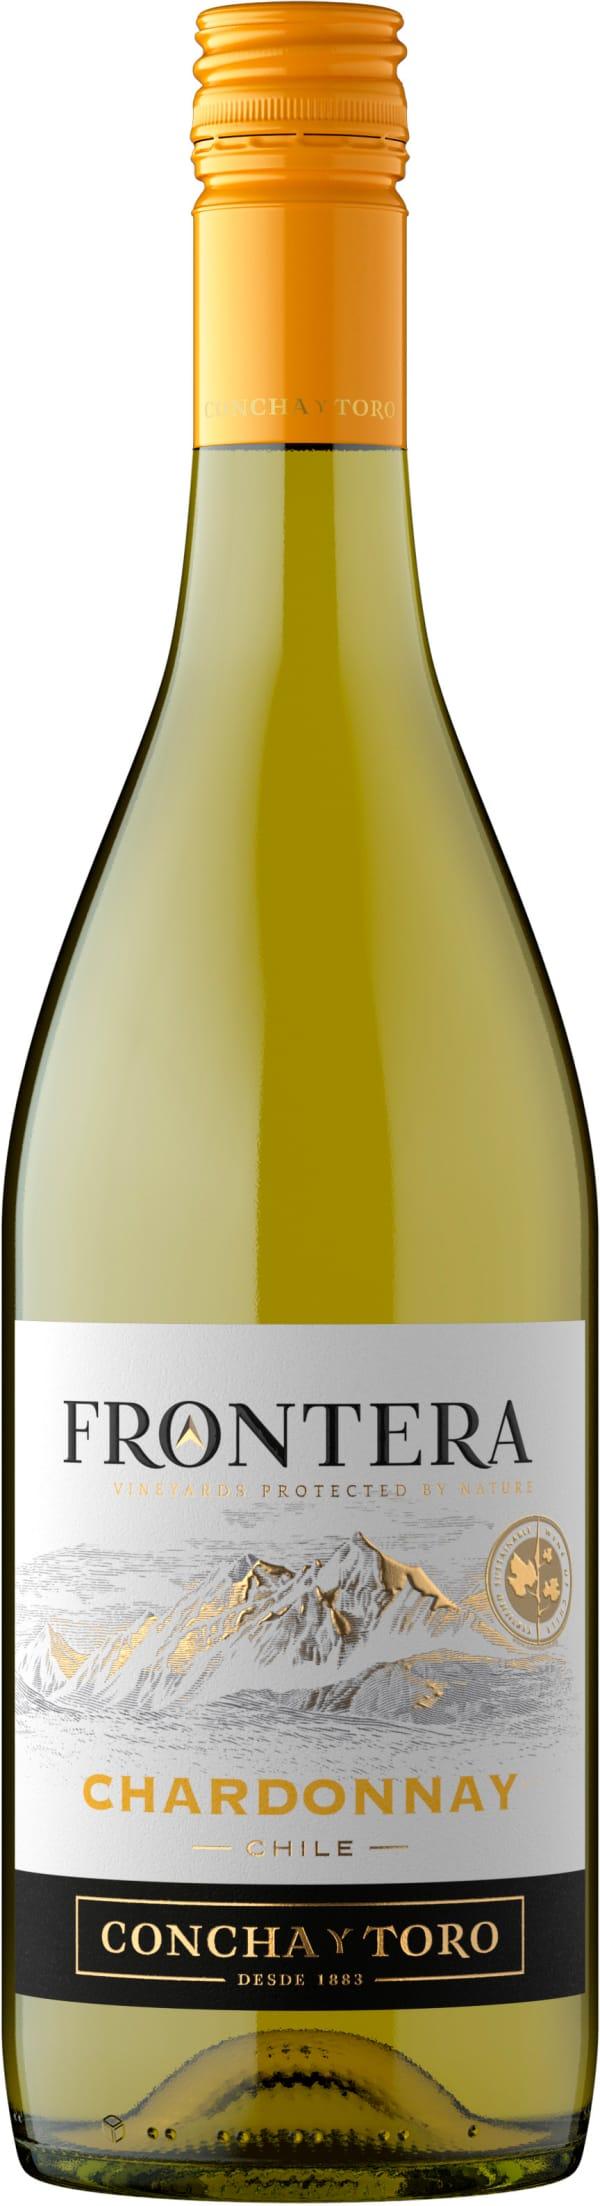 Frontera Chardonnay 2019